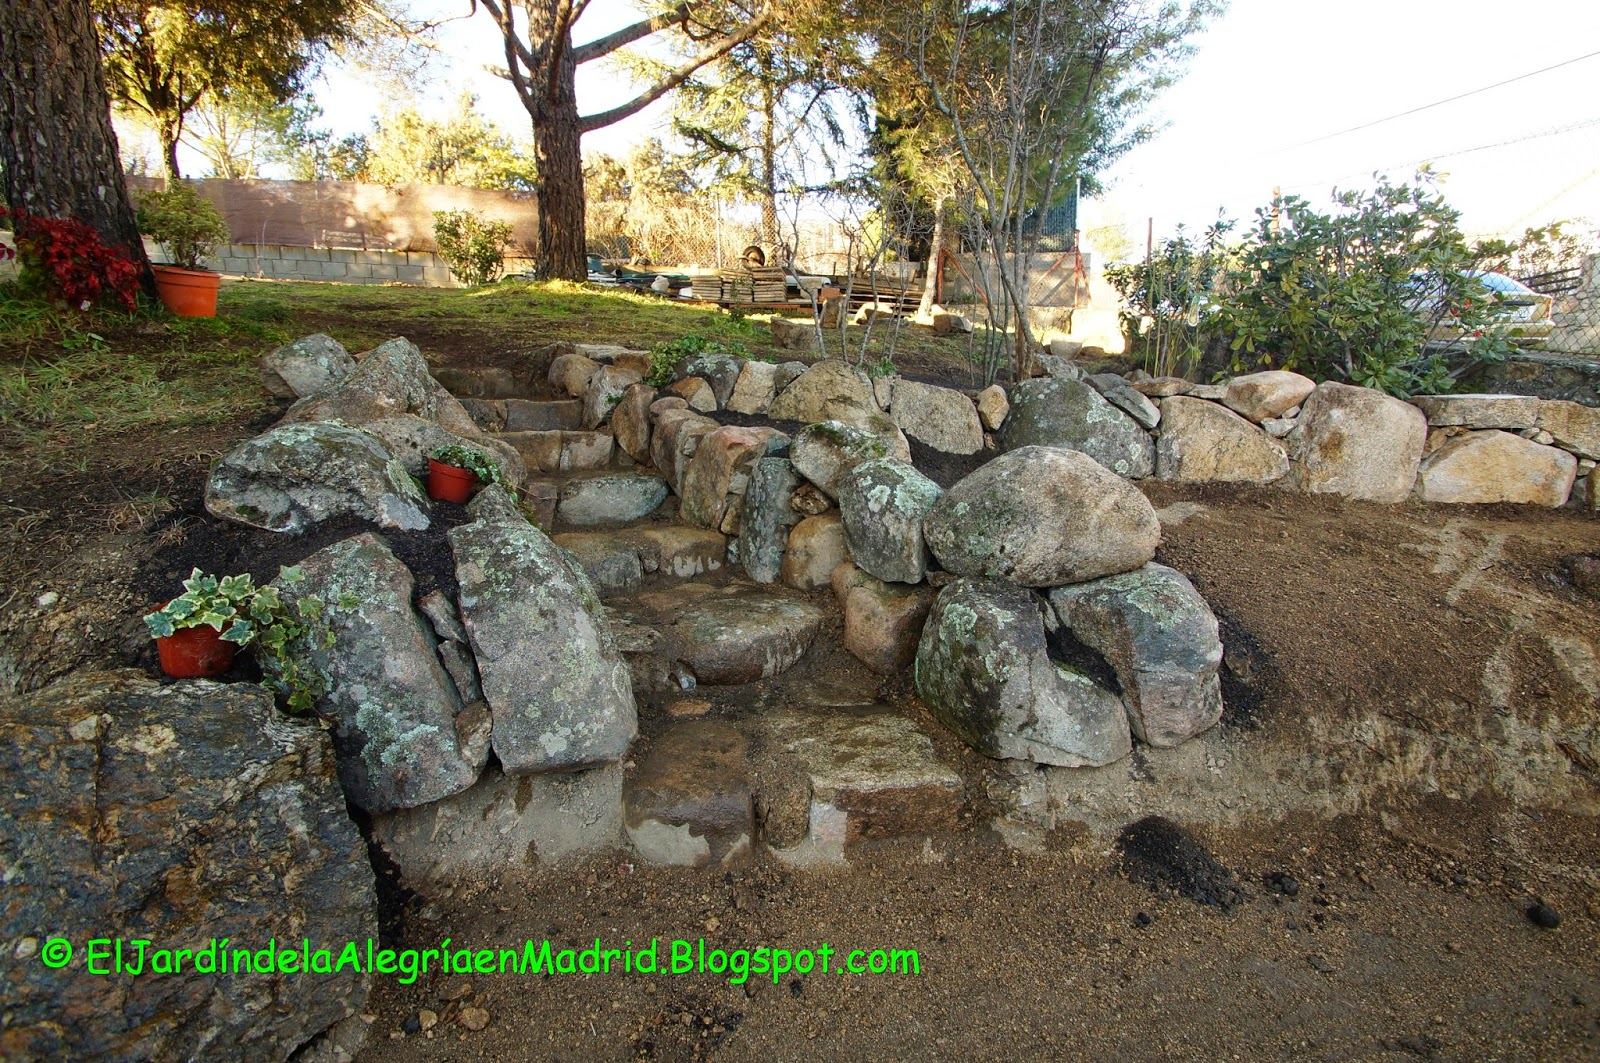 El jard n de la alegr a la salida del jard n secreto for Construir una escalera de jardin de madera